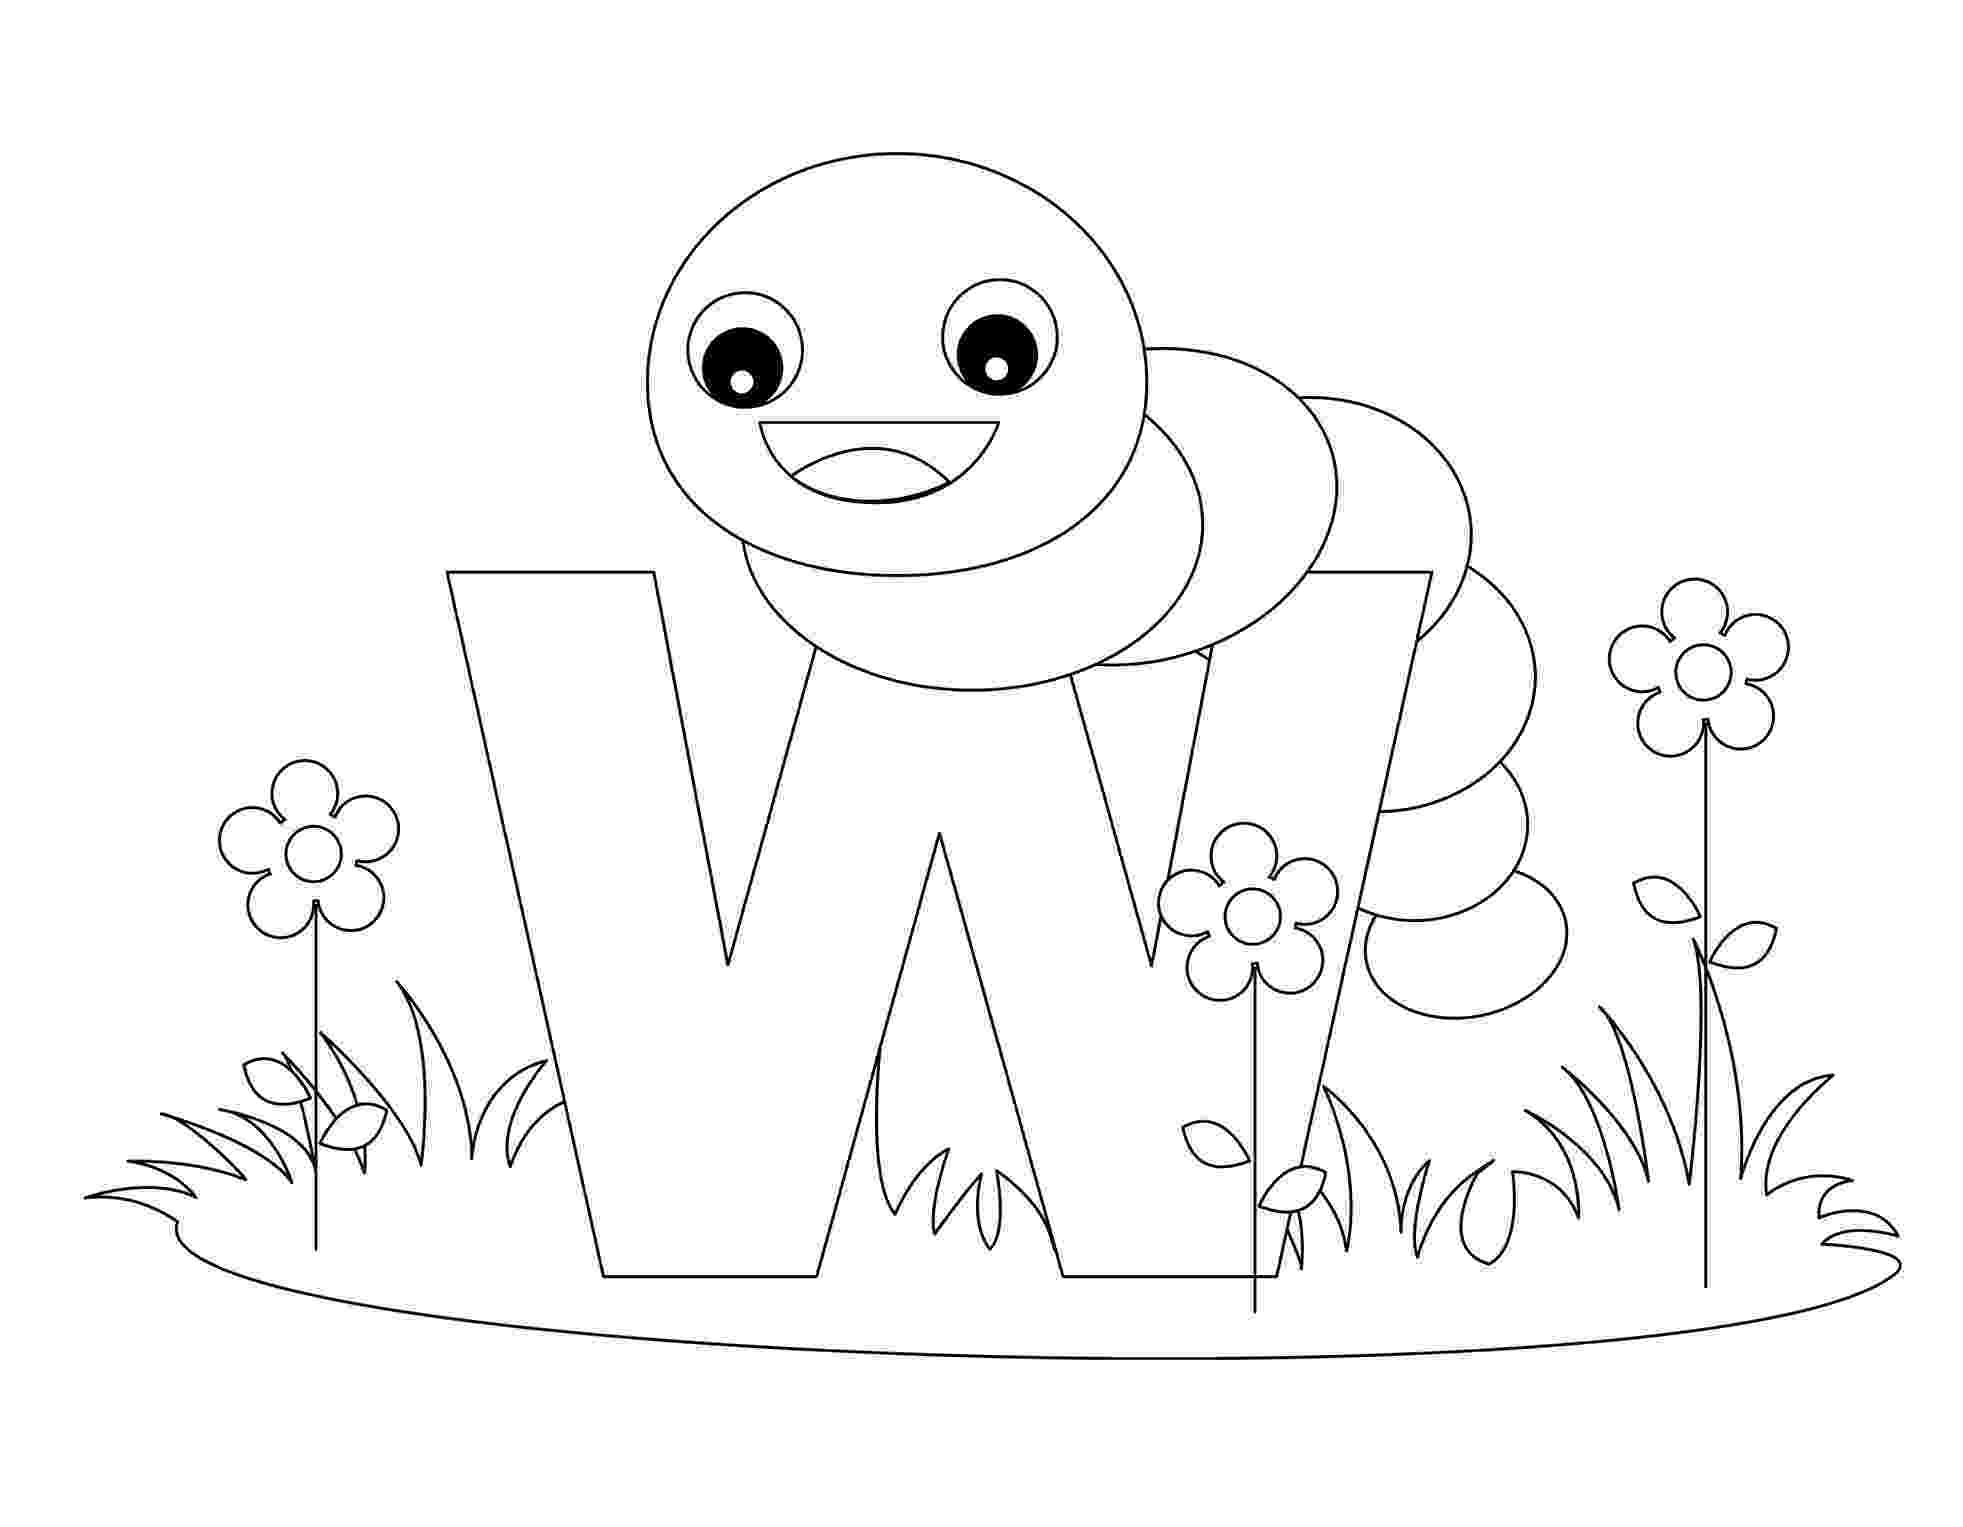 alphabet coloring worksheets free printable alphabet coloring pages for kids best coloring alphabet worksheets 1 3